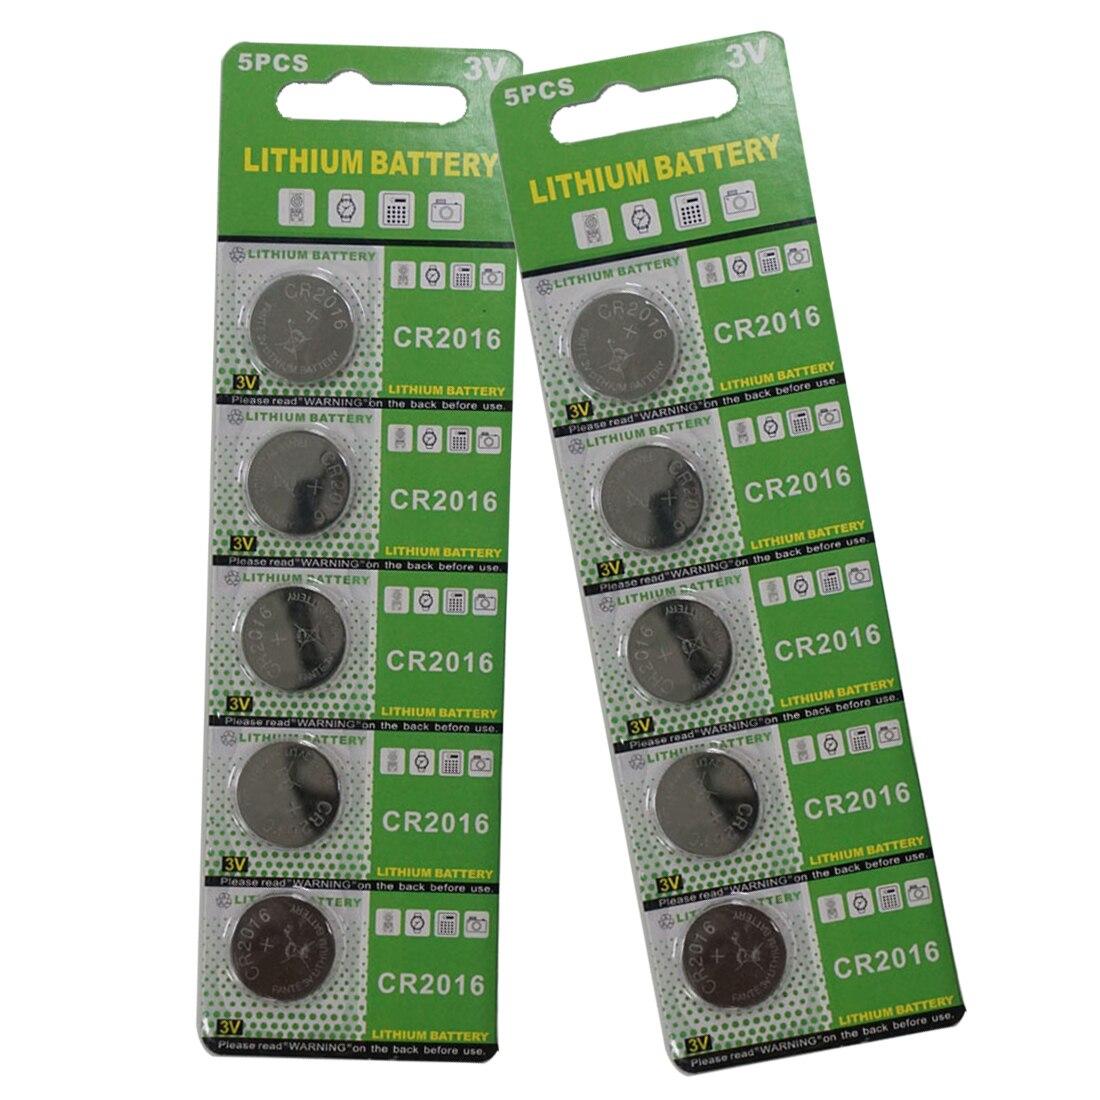 Centechia Top Sale 20Pcs CR2017 3V Cell Battery Button Battery ,Coin Battery,cr 2017 lithium battery